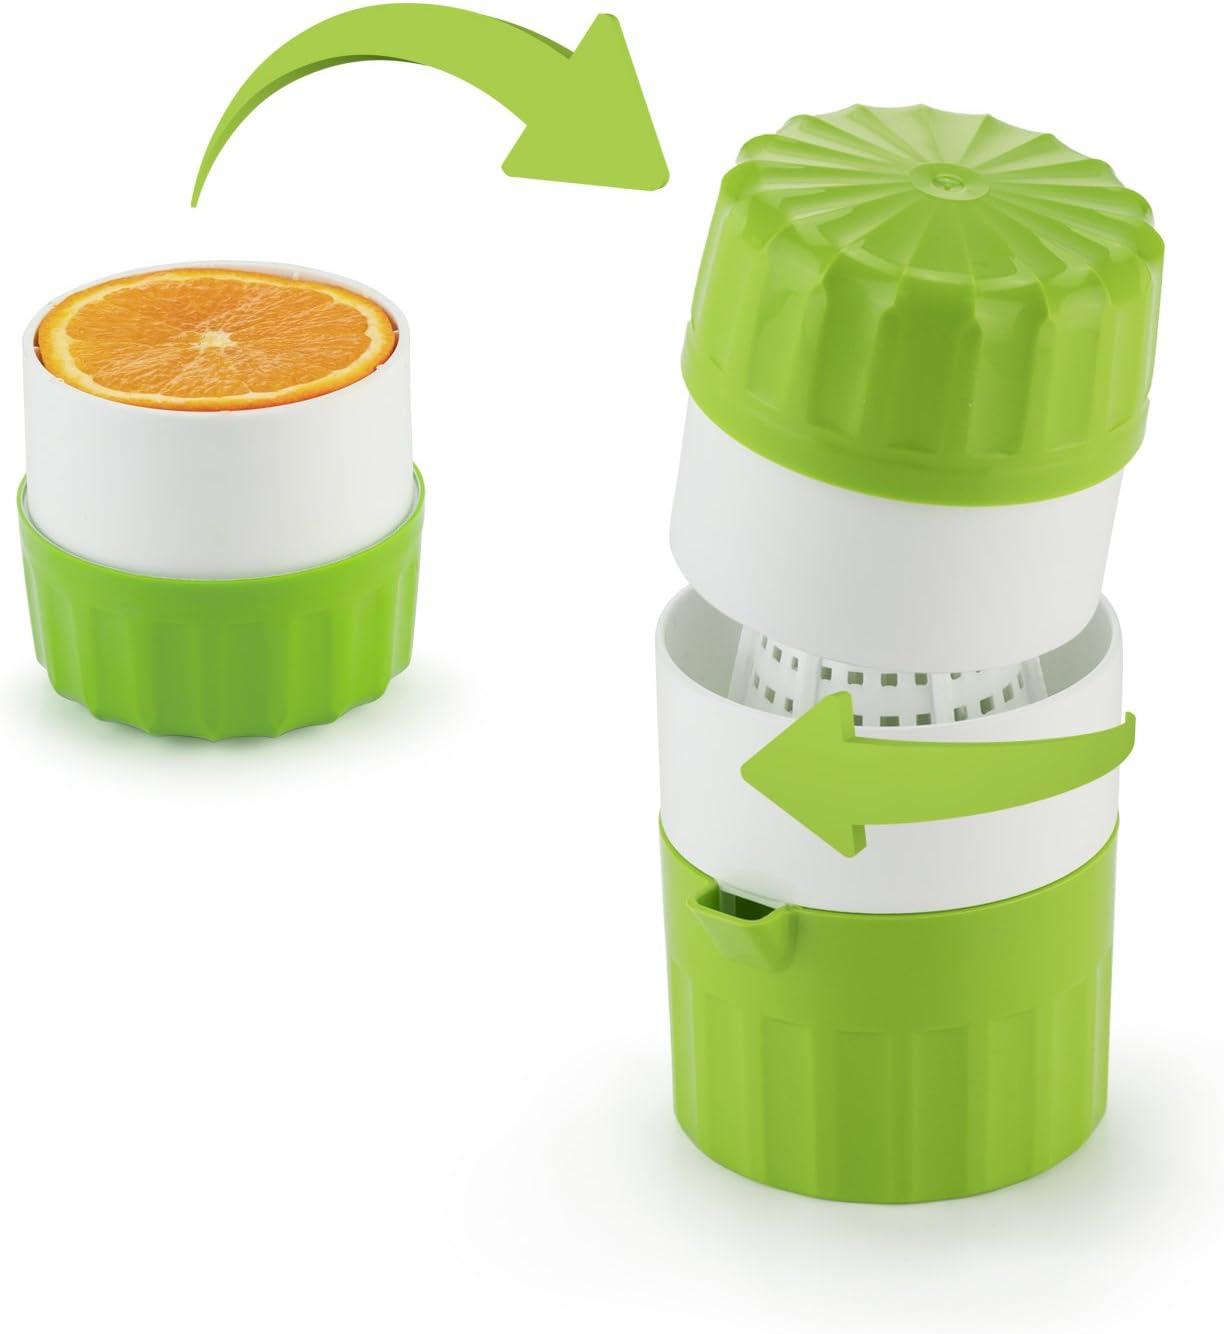 Borner/'s juicer